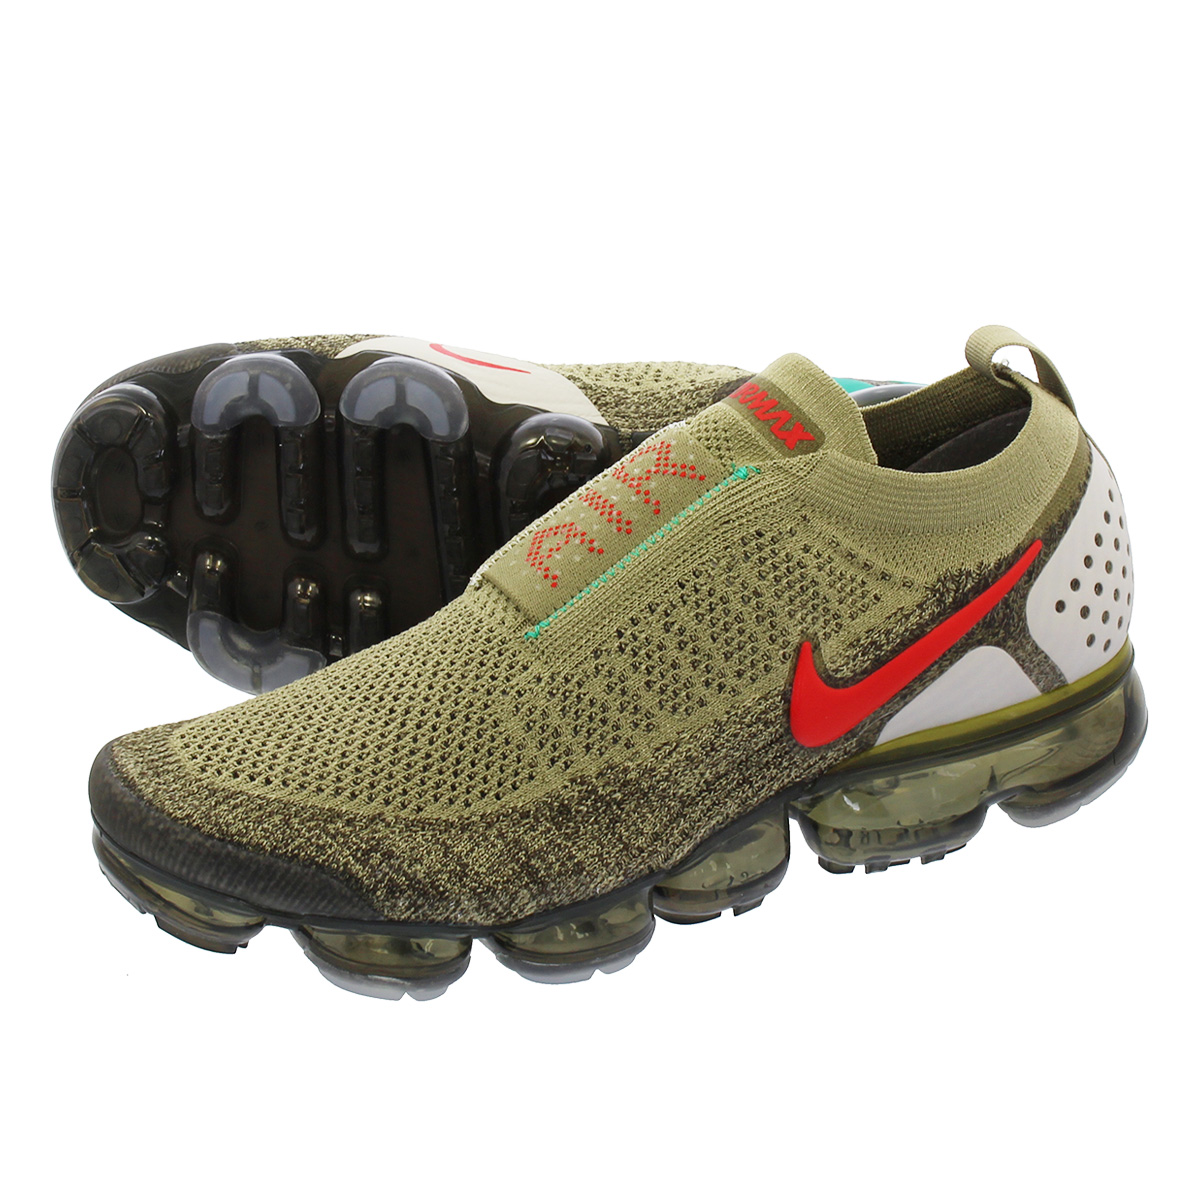 3250f9f6b2ac4 NIKE AIR VAPORMAX MOC 2 Nike air vapor max fried food knit mock 2 NEUTRAL  OLIVE HABANERO RED ah7006-200